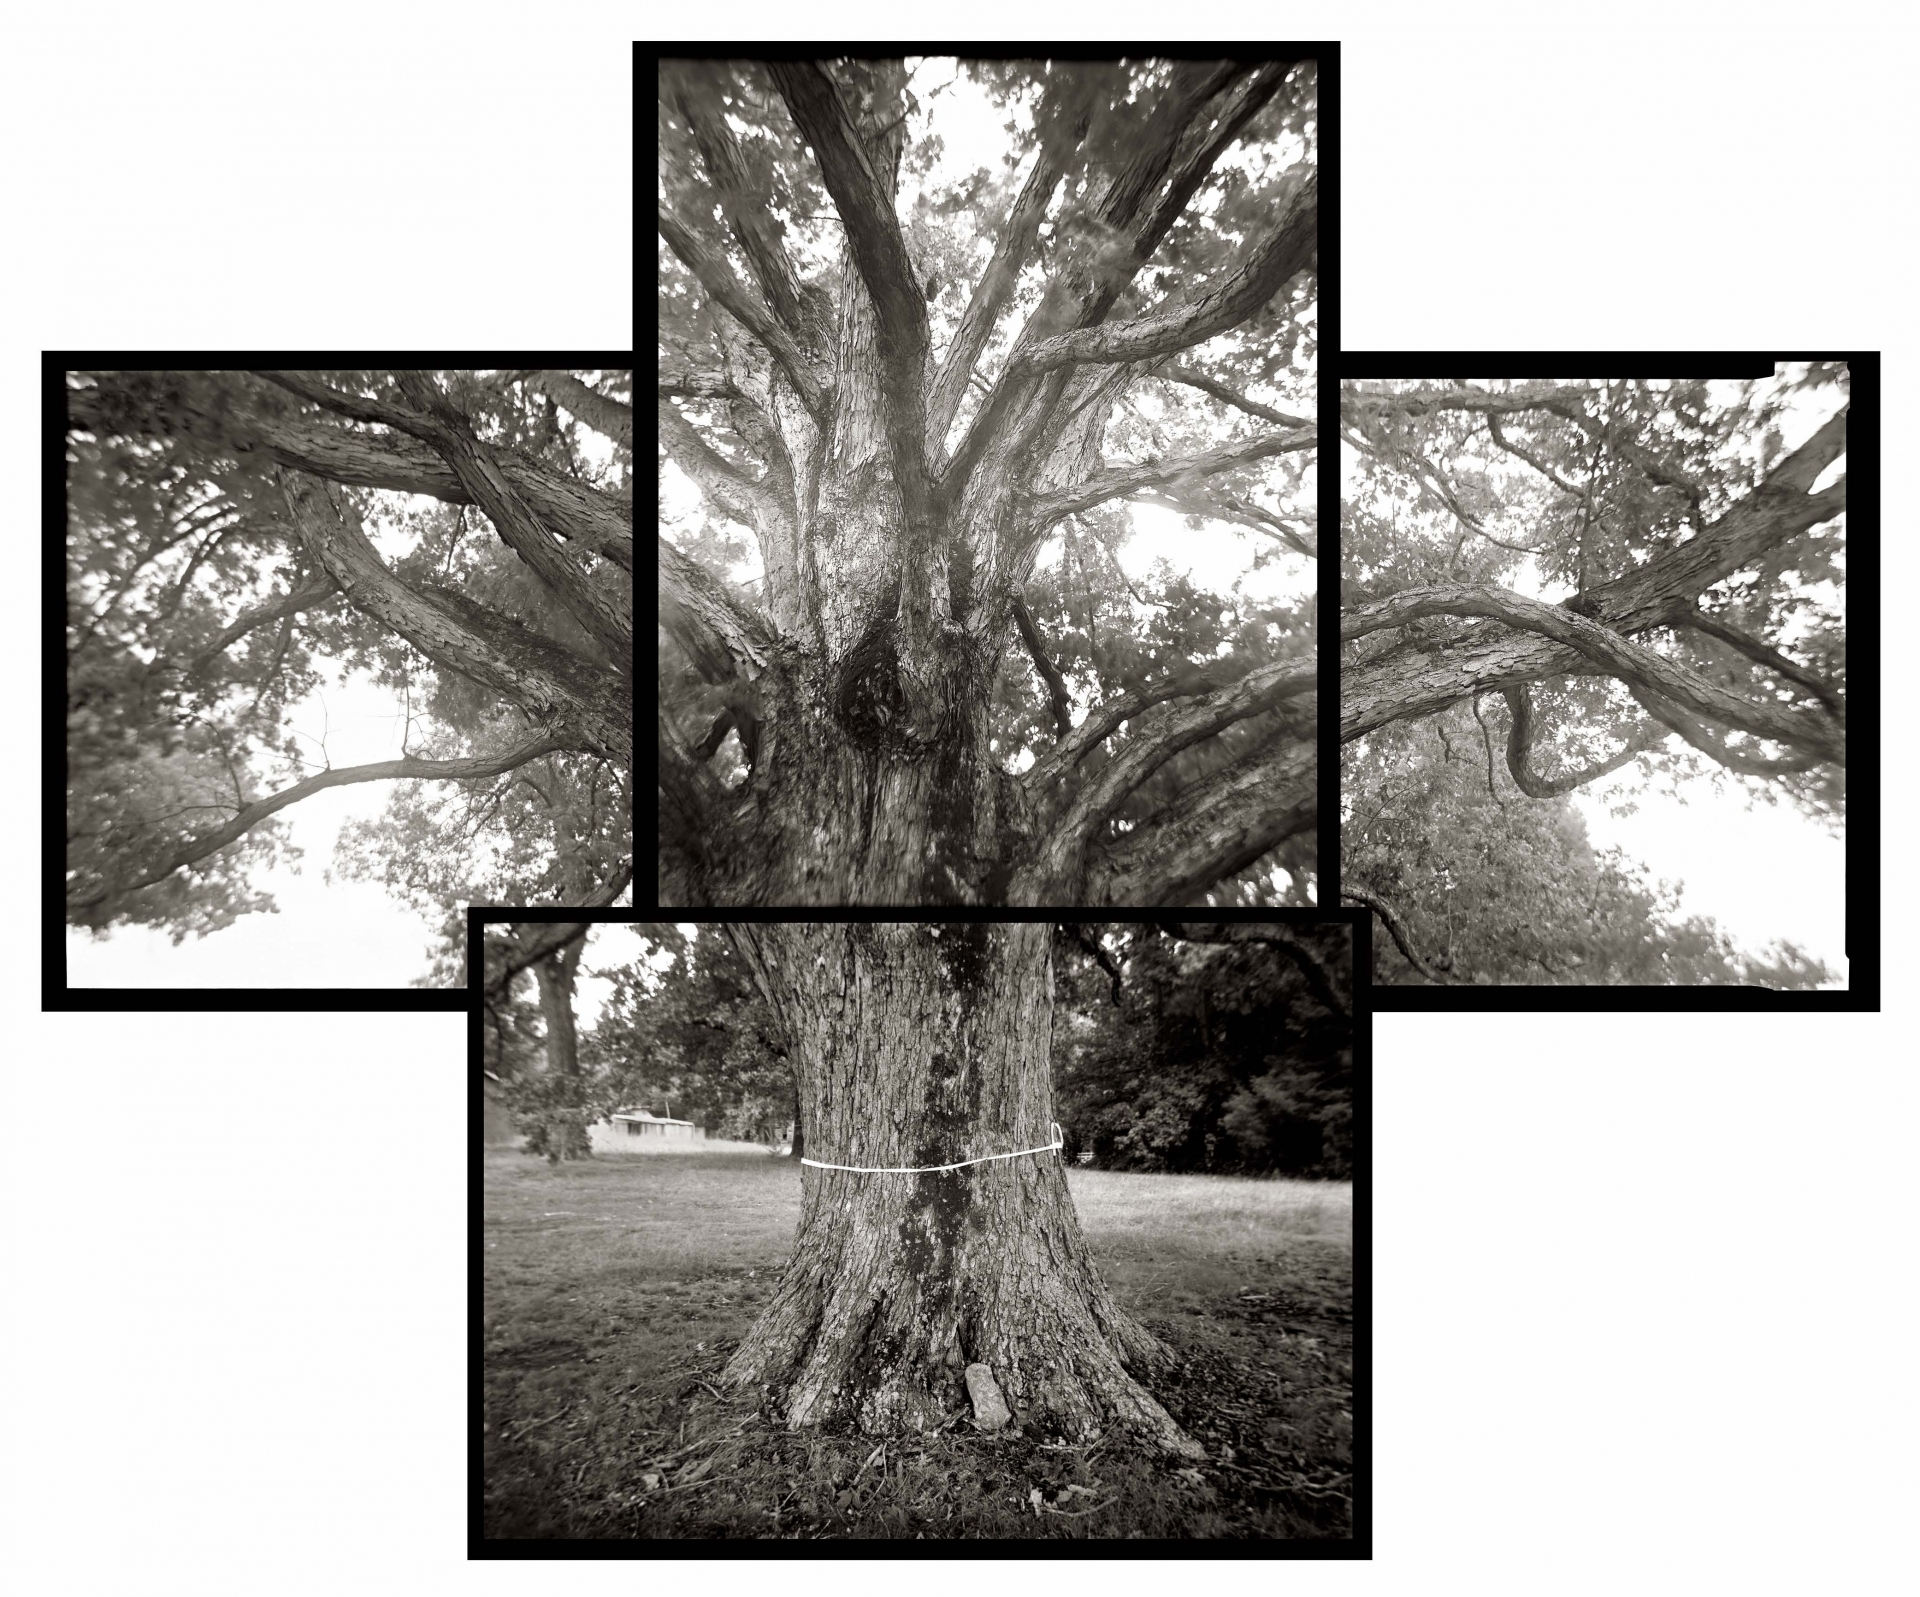 Spared Tree by Linda Foard Roberts